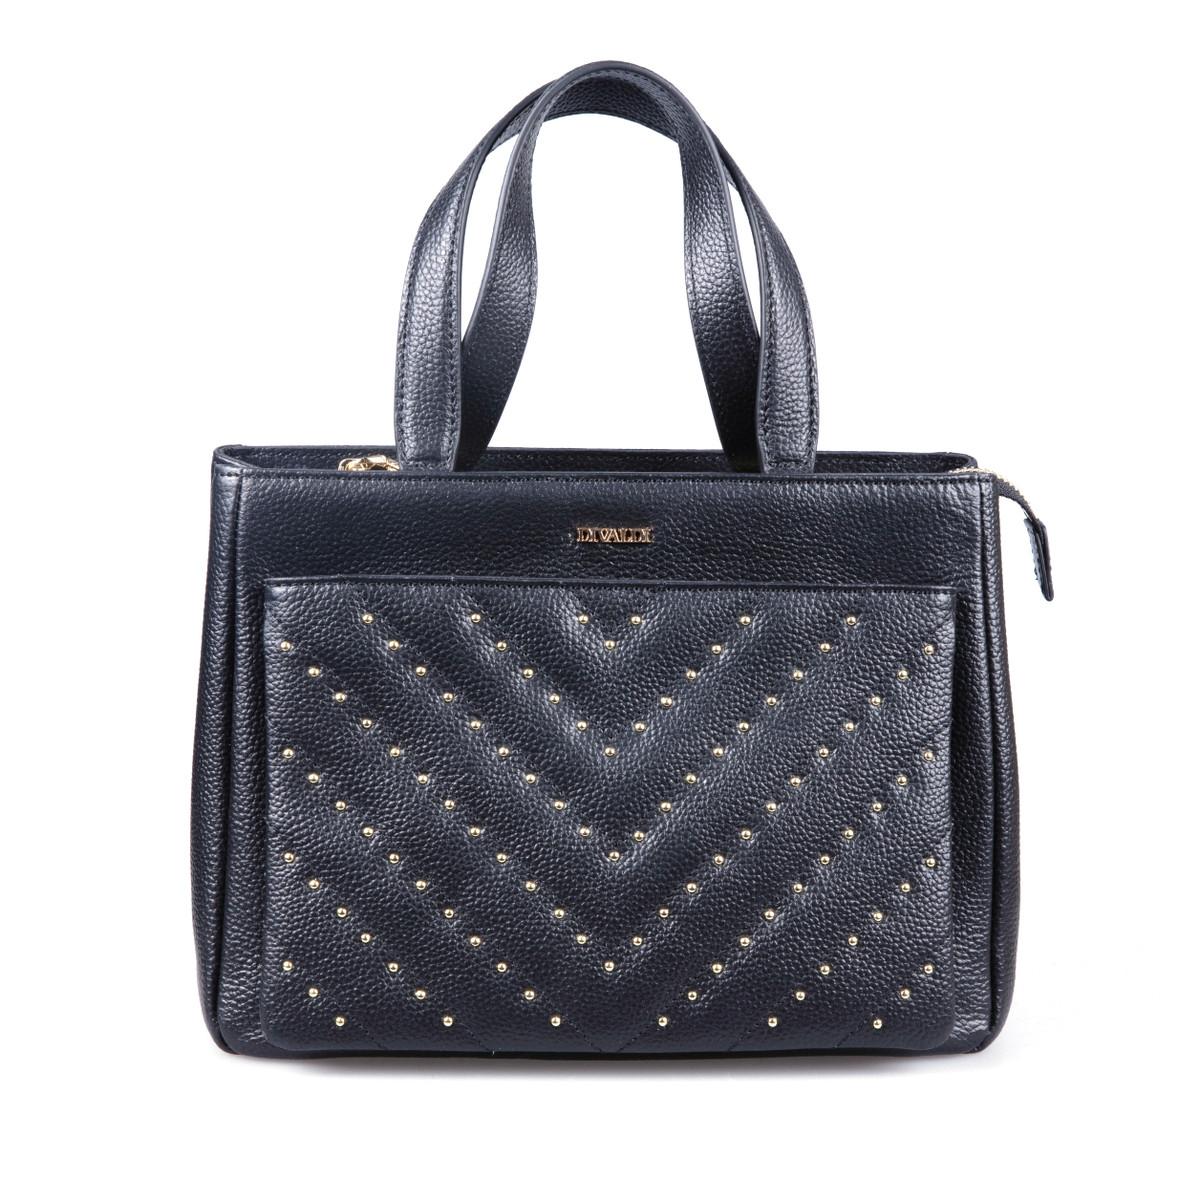 CLAUDIA HAND BAG WITH STUDS DVA-B-53022